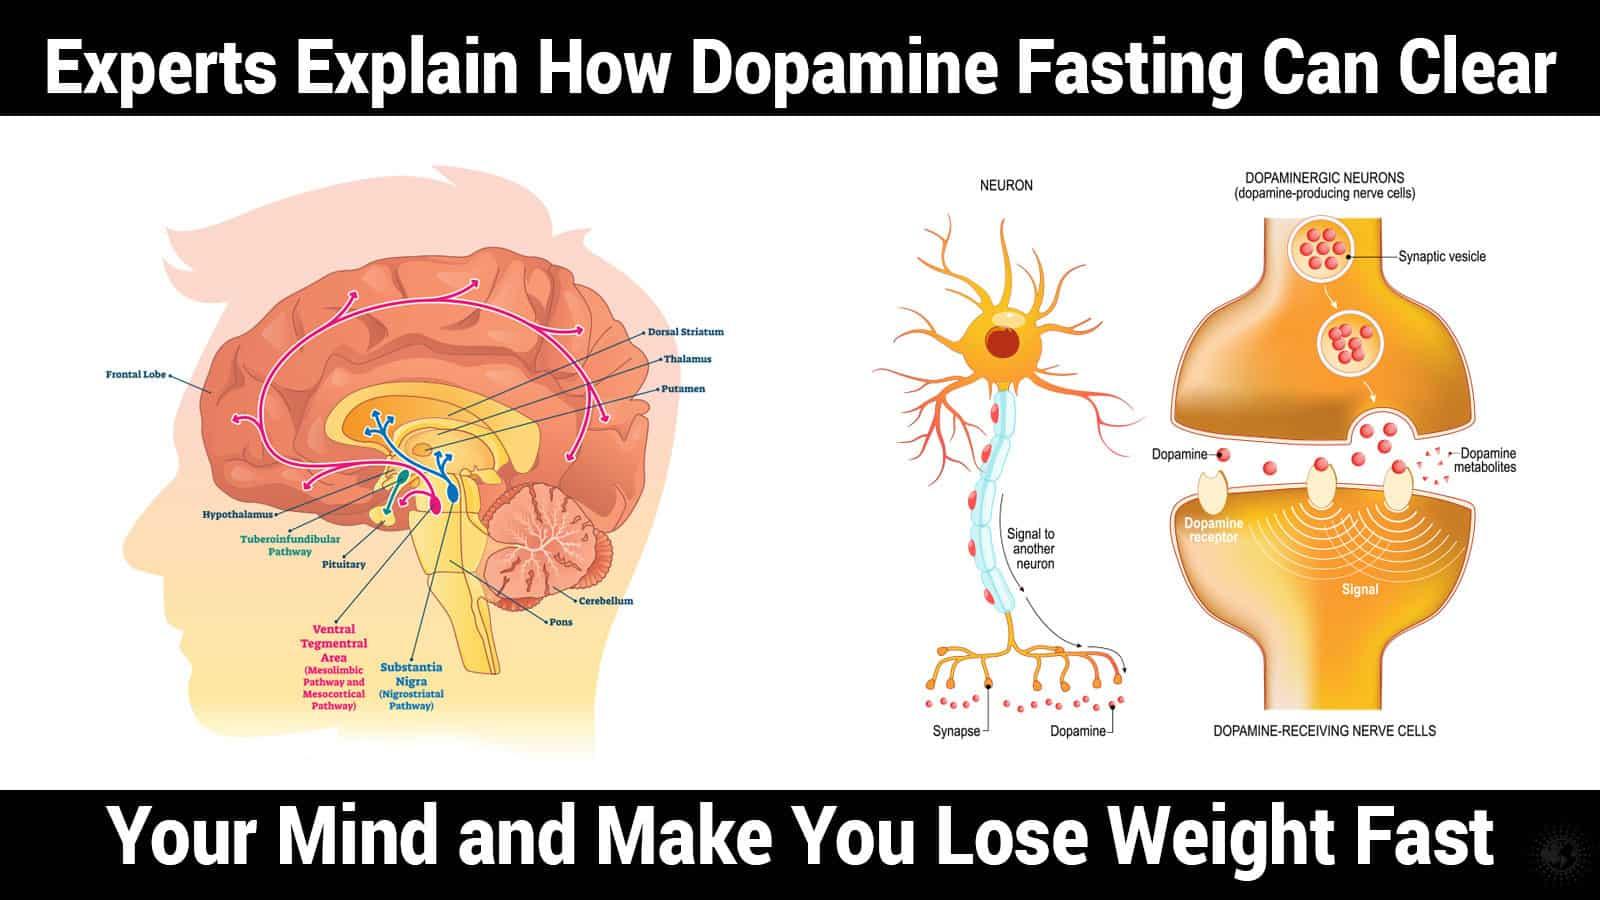 dopamine fasting